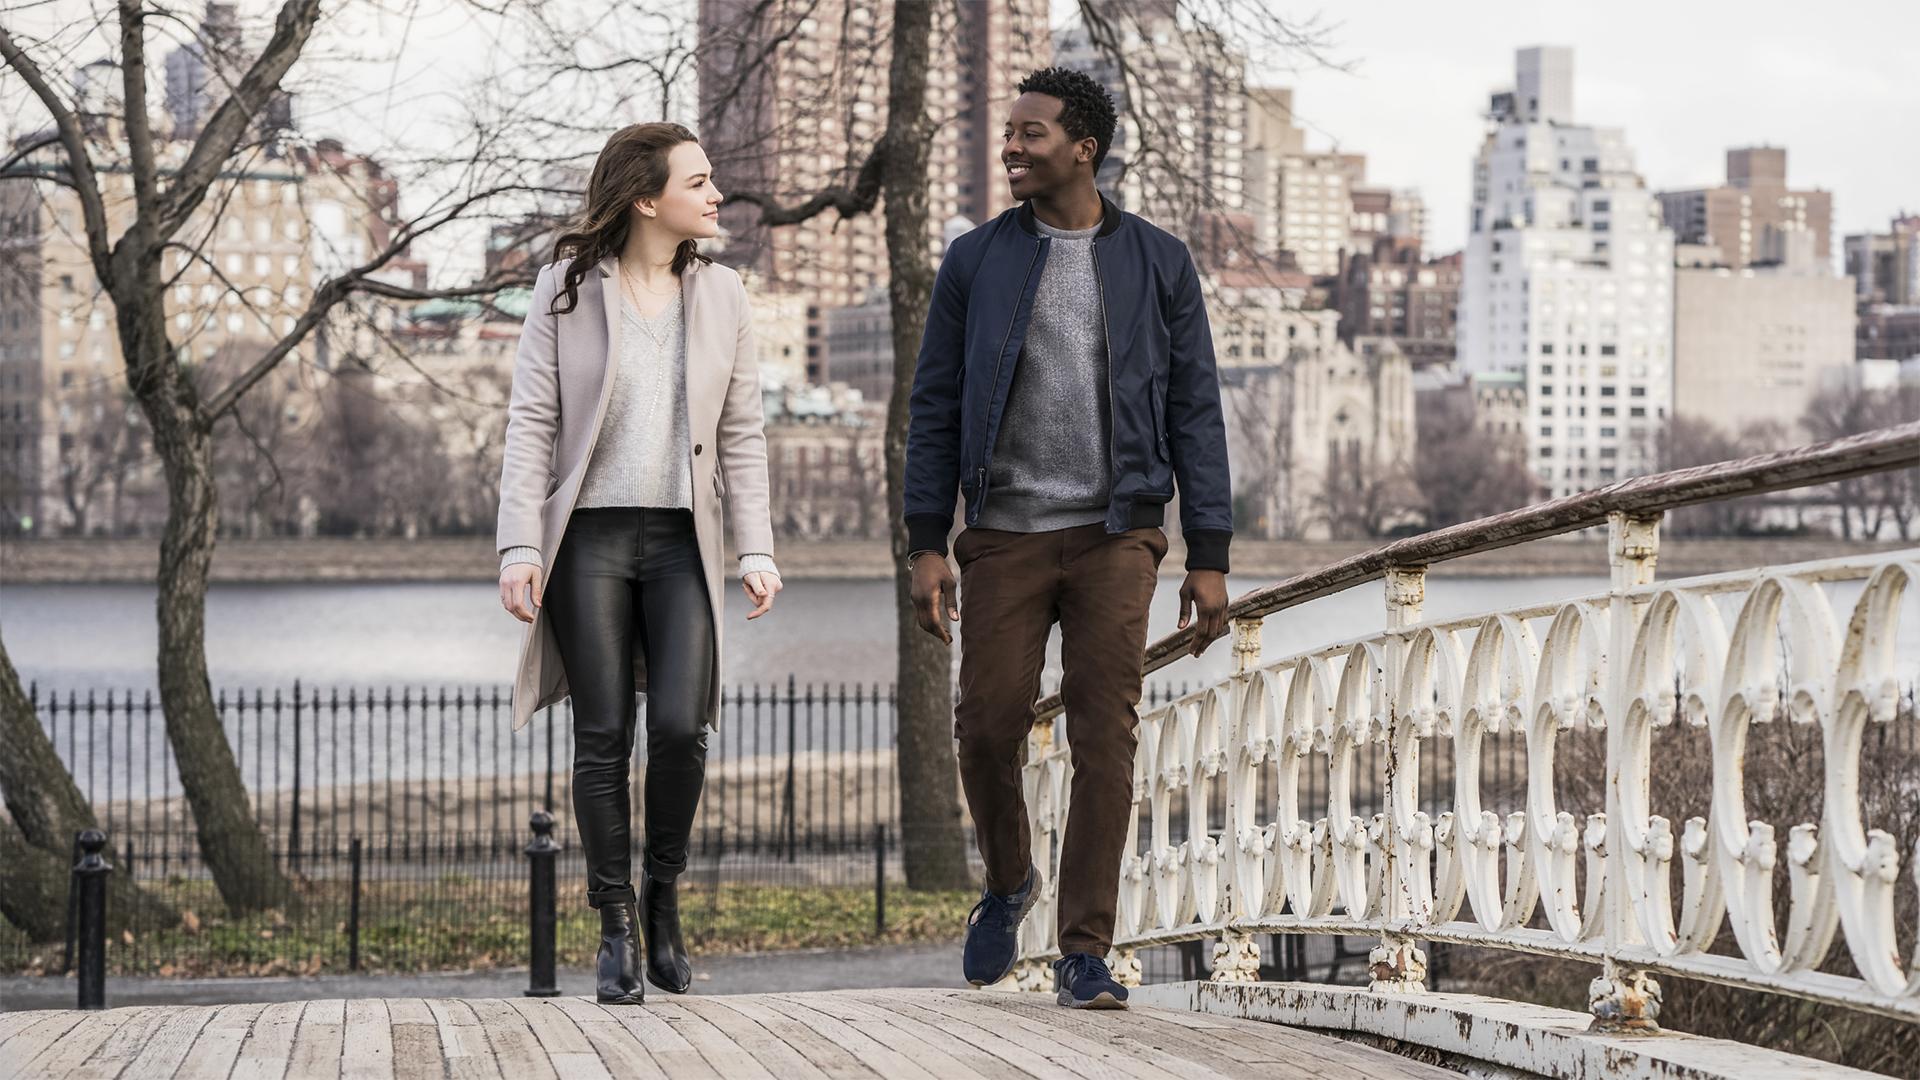 30 days tv show atheist dating